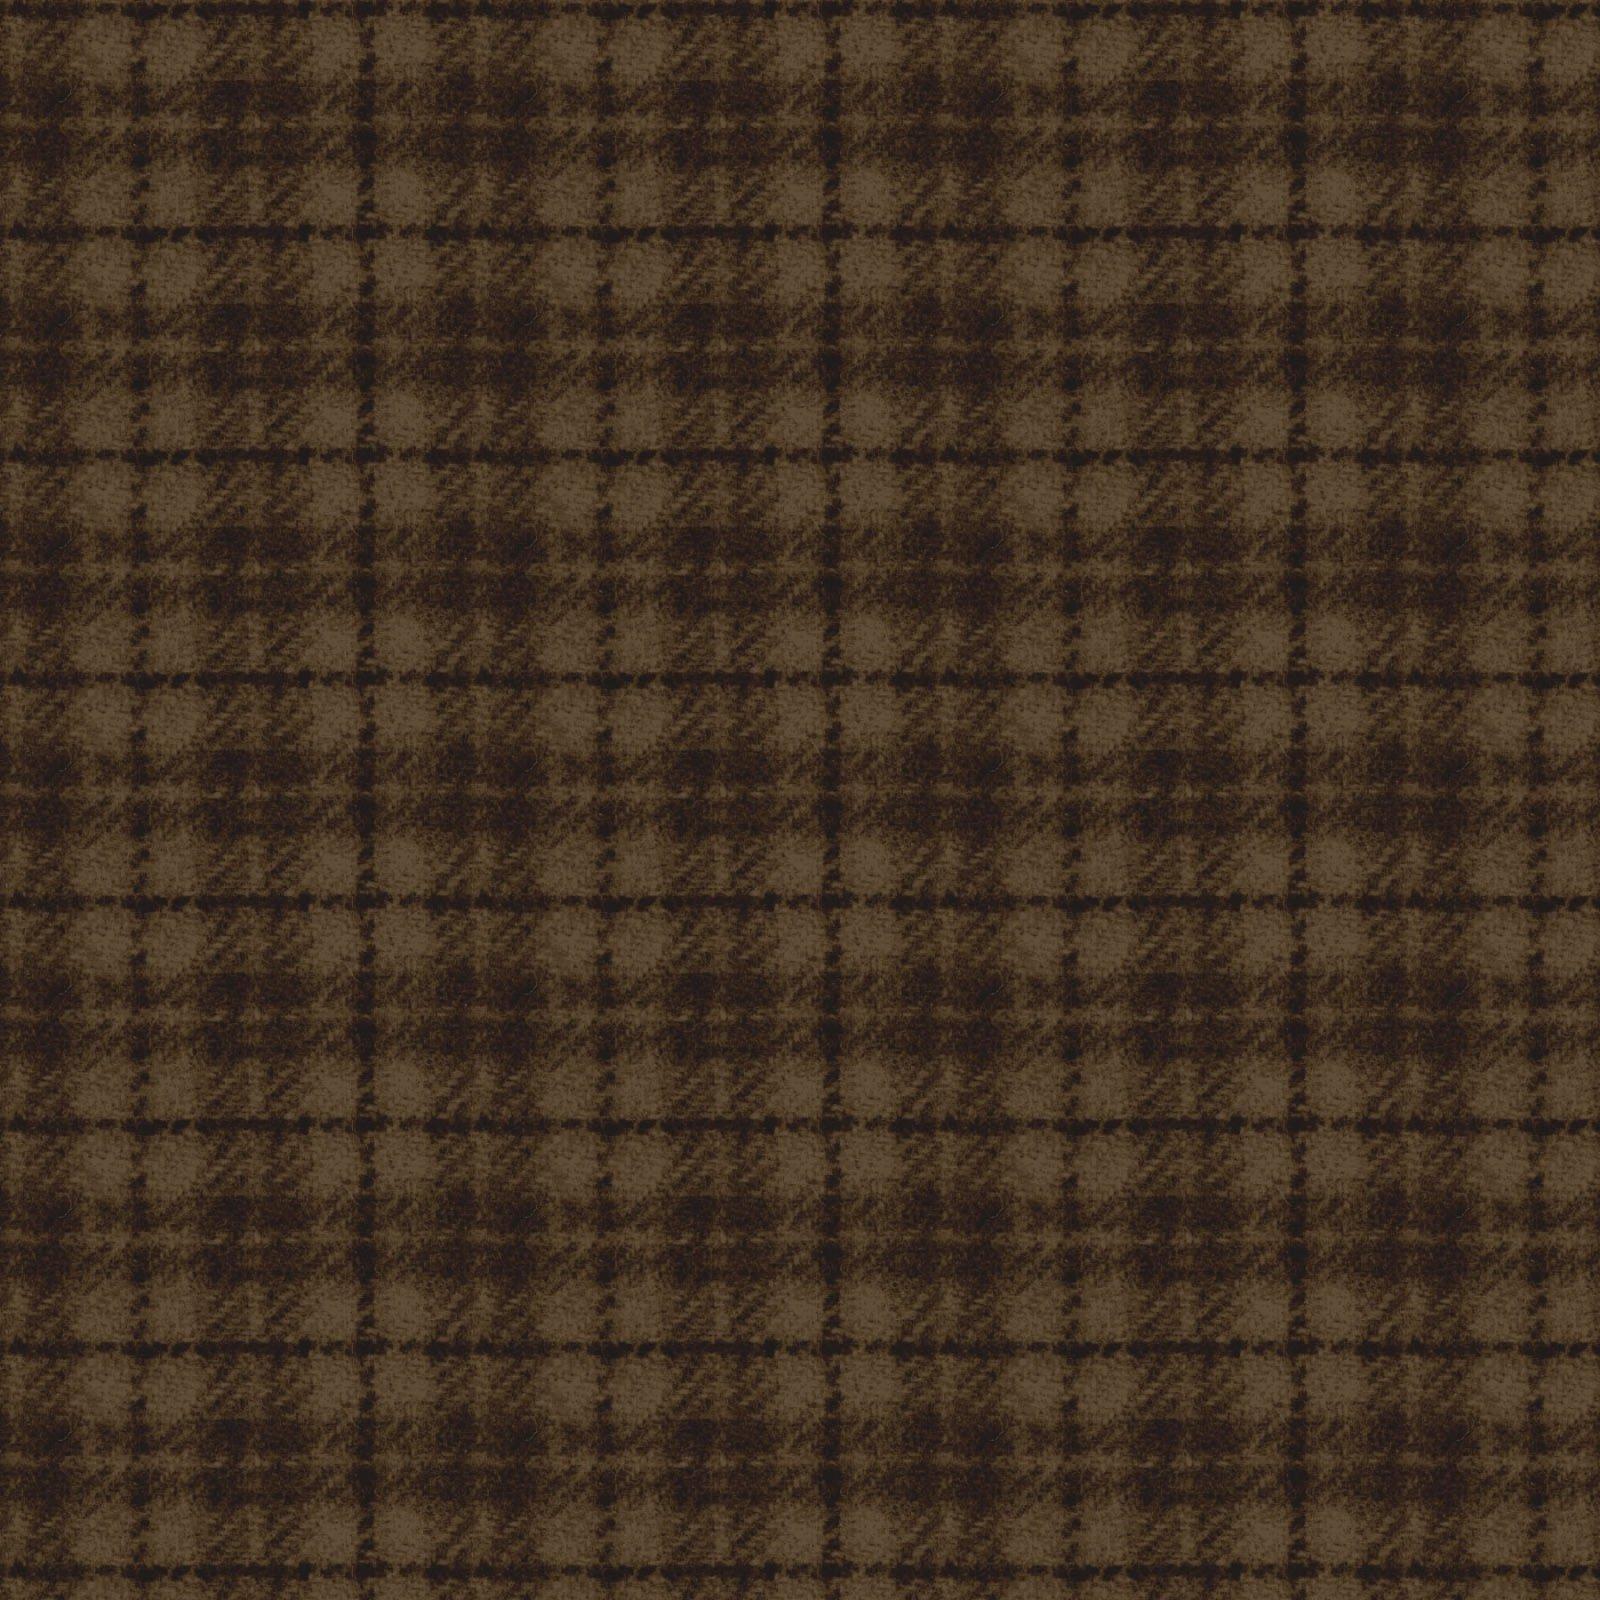 Woolies Flannel Plaid Brown (MASF18502-A)